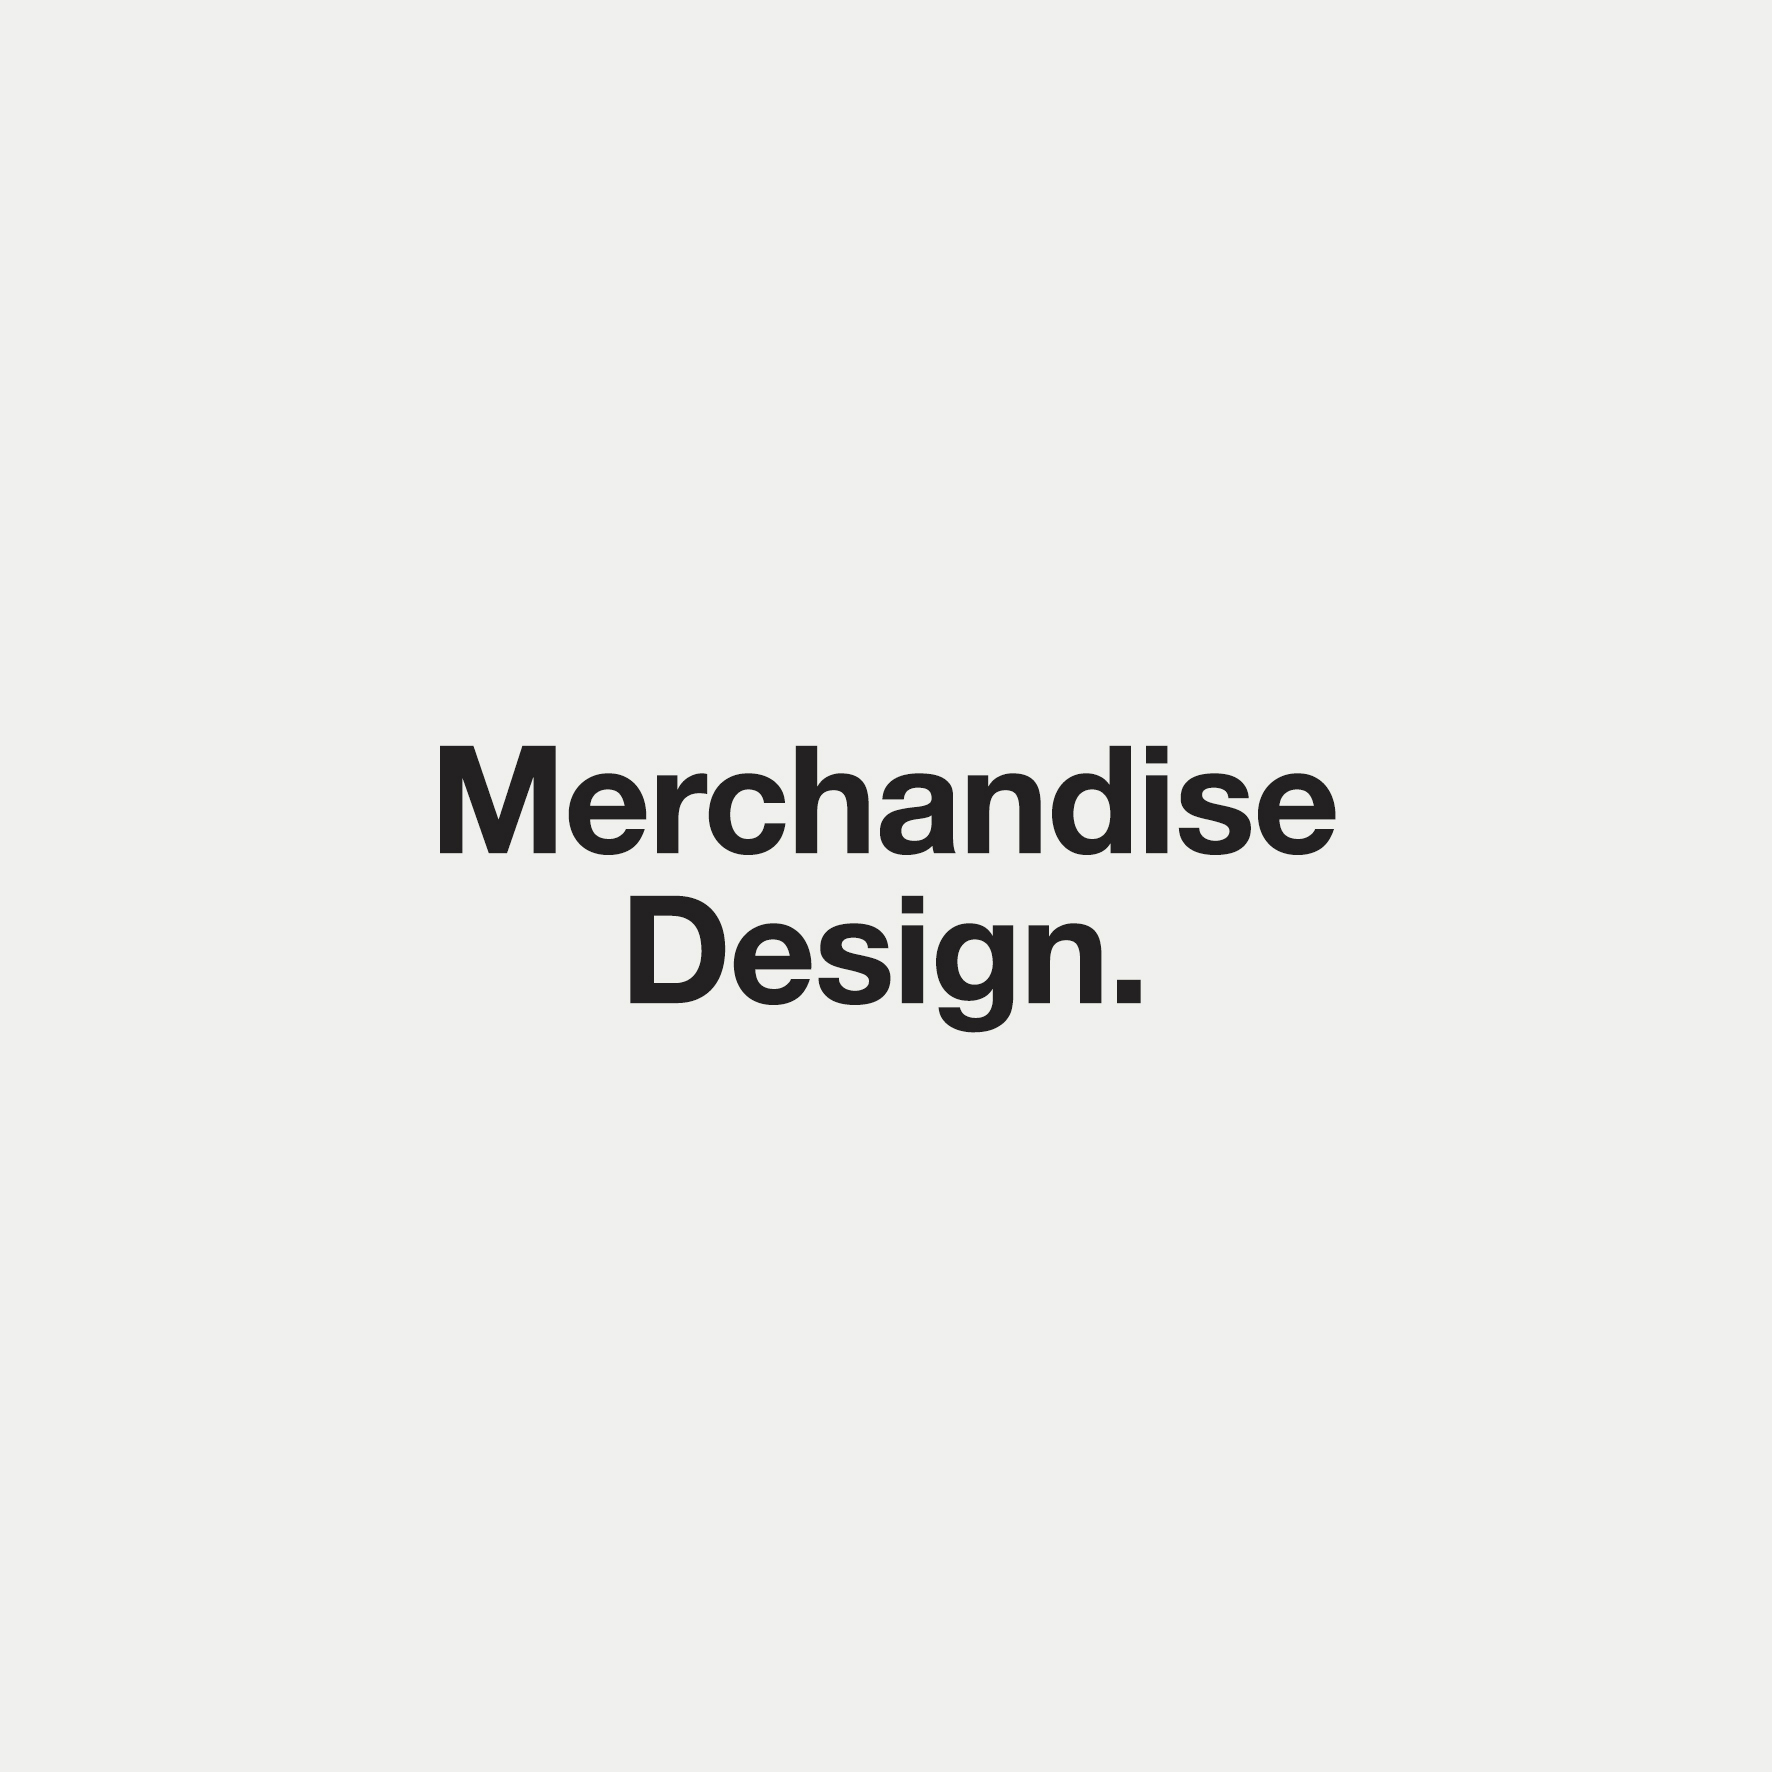 Design - Merch Thumbnail.jpg